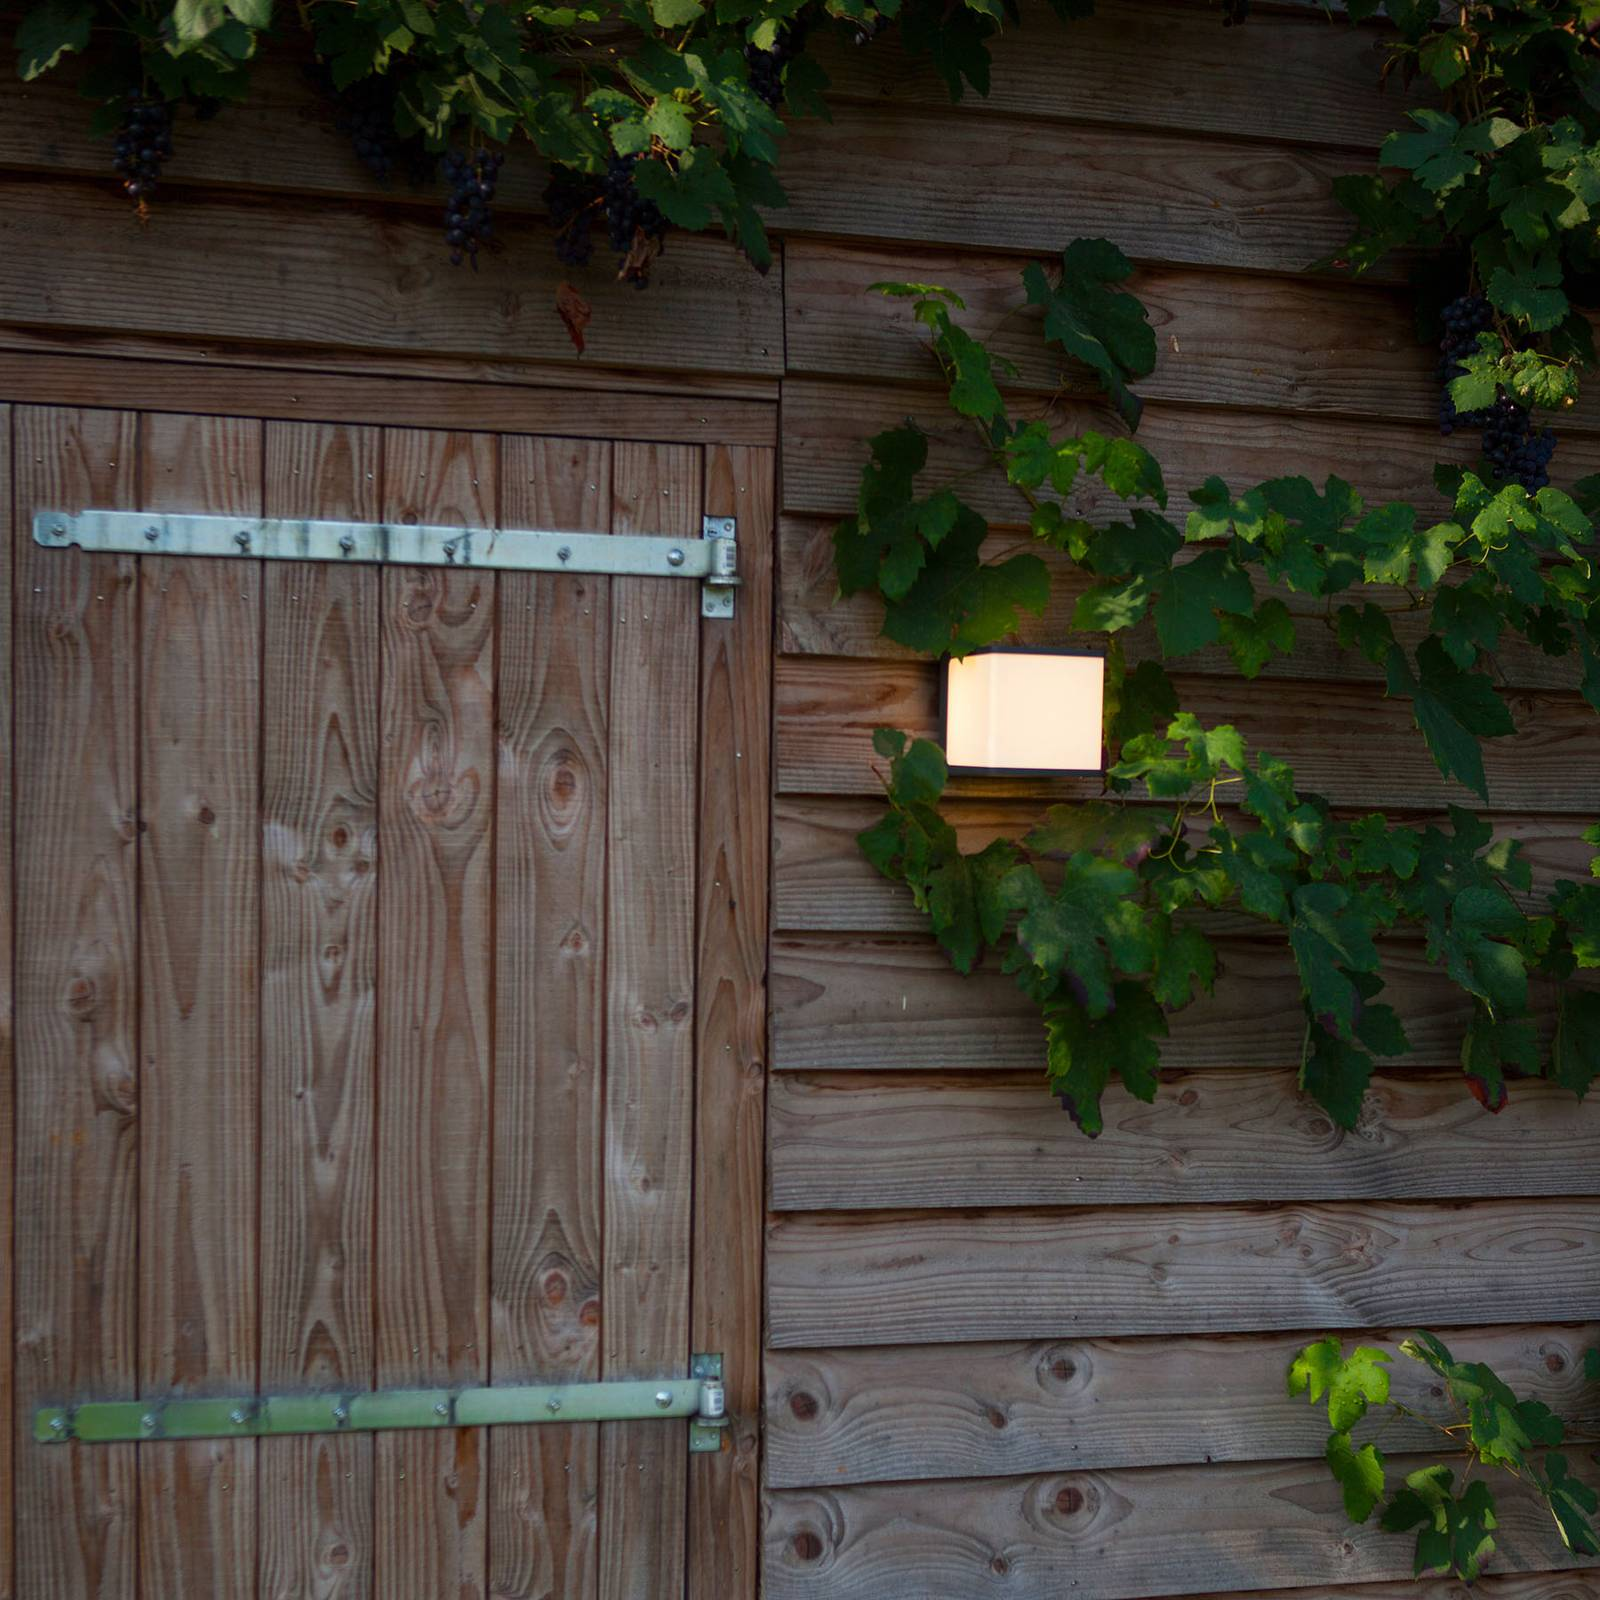 LED-ulkoseinälamppu Doblo, korkeus 15 cm